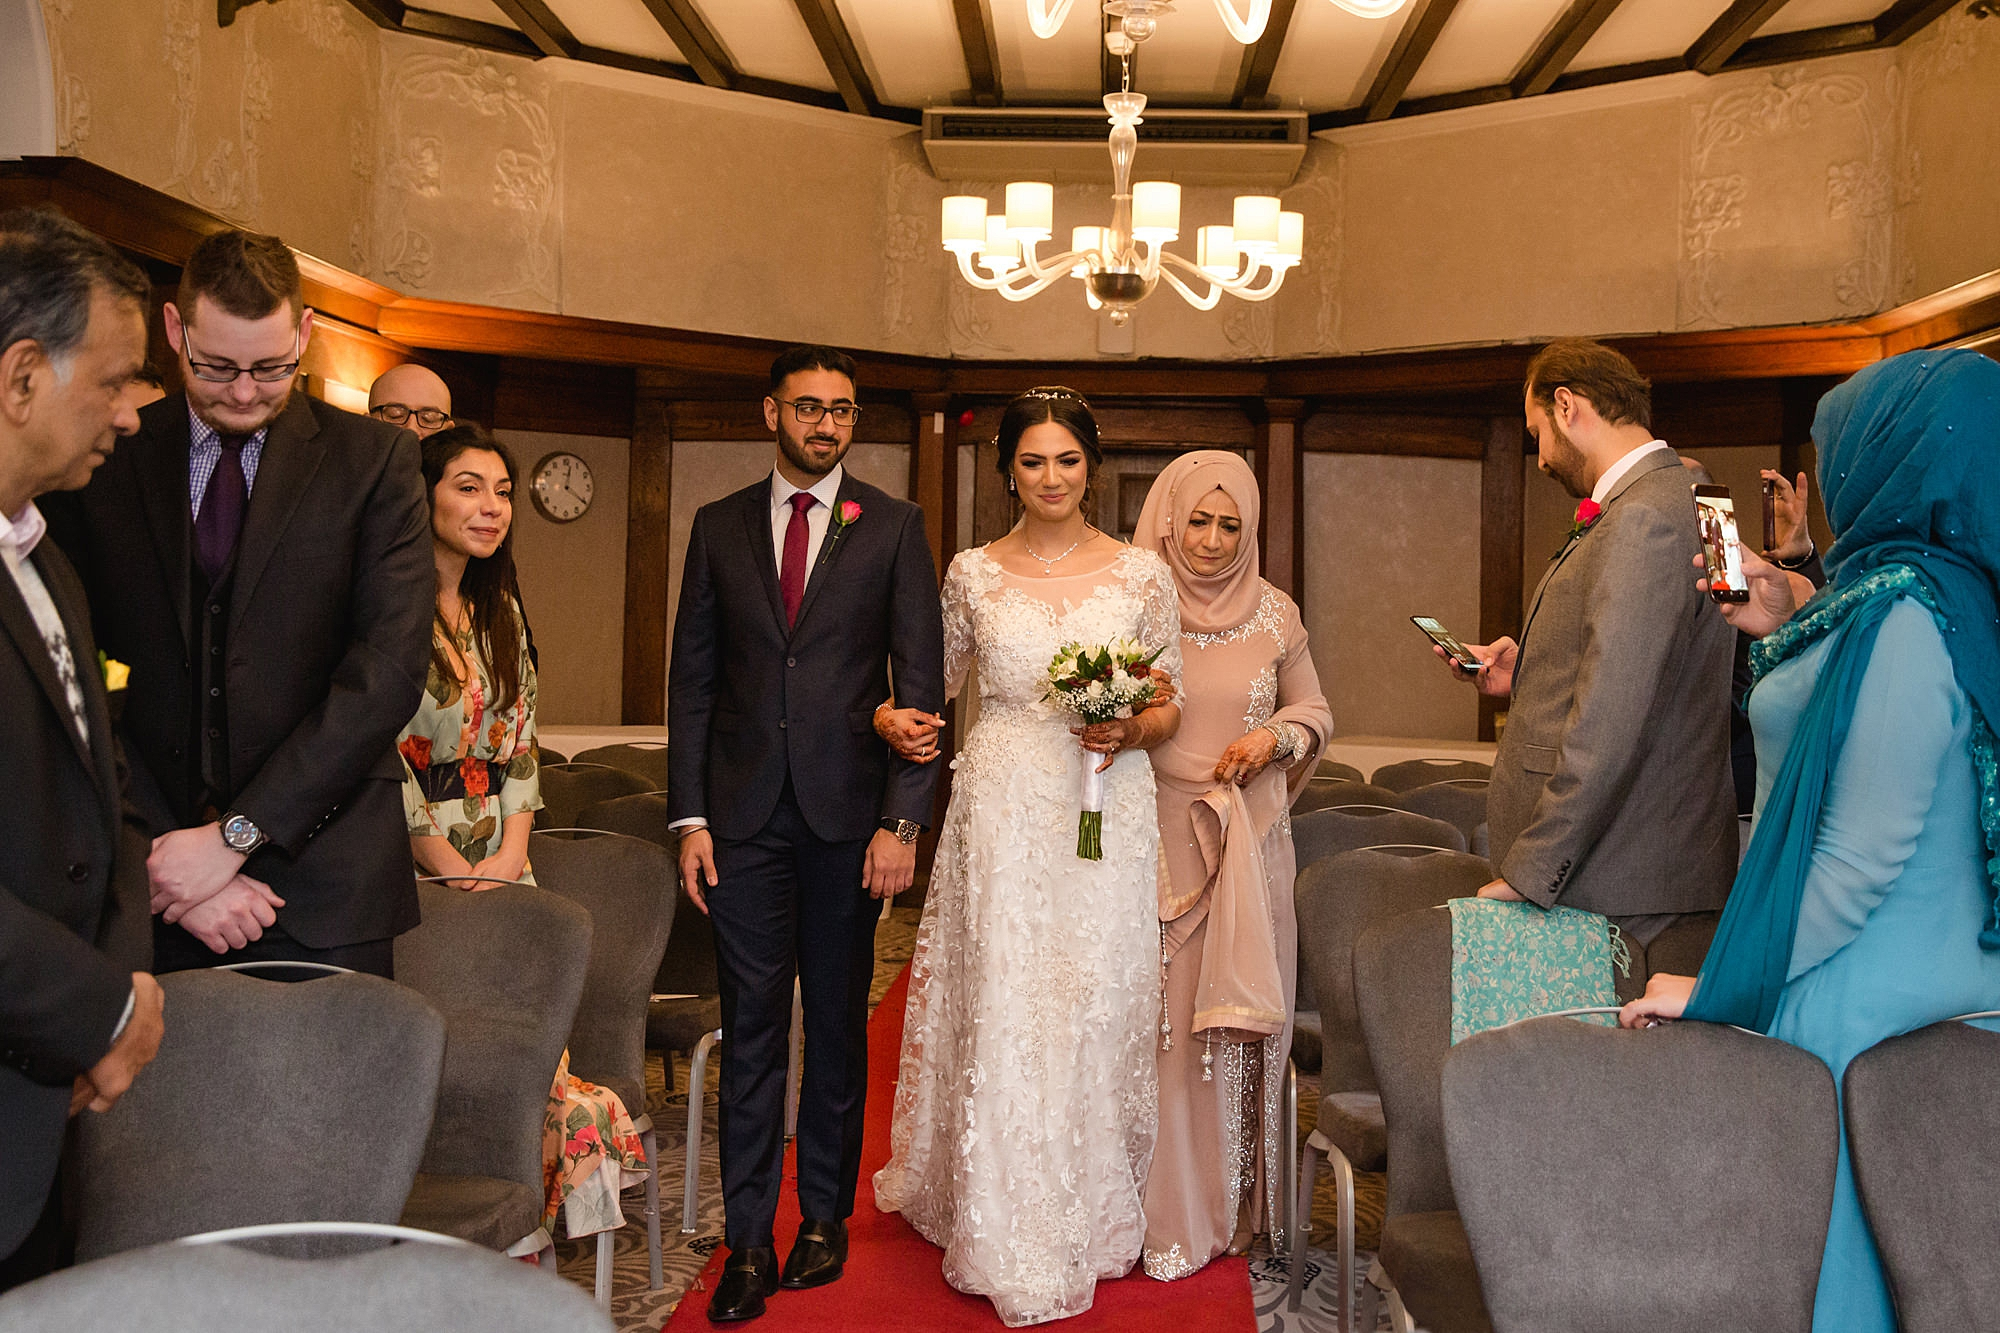 Richmond Hill Hotel wedding photography bride walking down the aisle